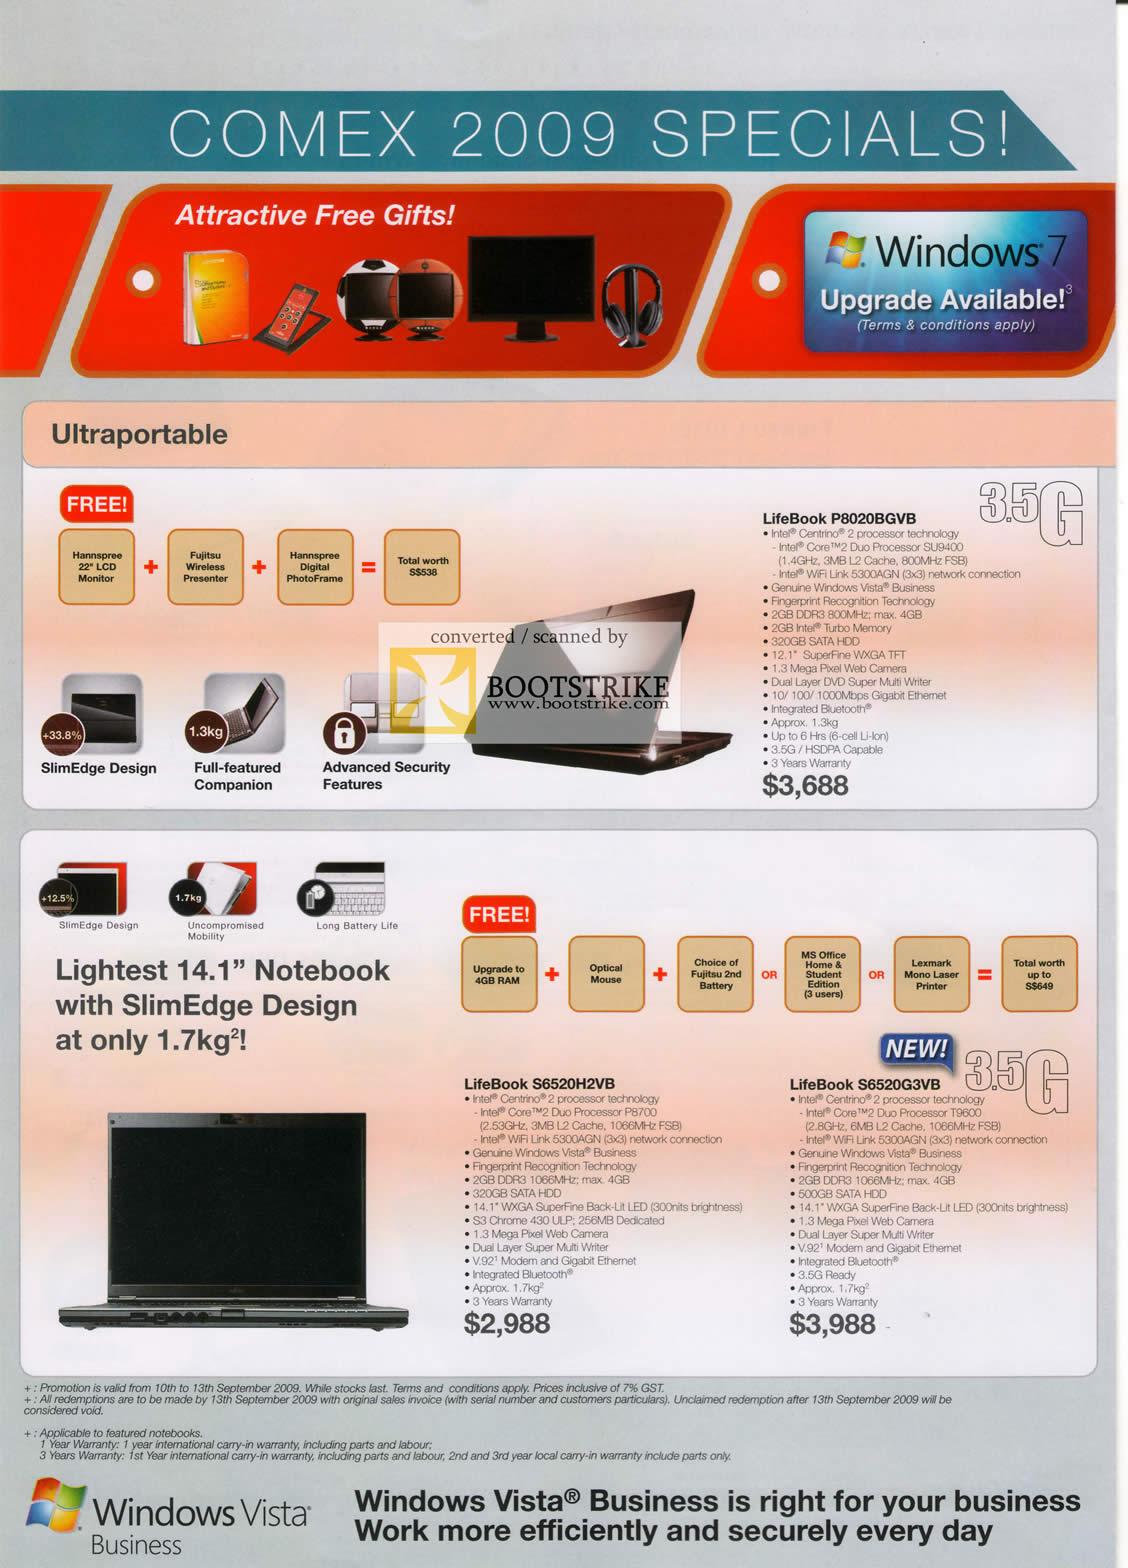 Comex 2009 price list image brochure of Fujitsu Notebooks LifeBook P8020BGVB S6520H2VB S6520G3VB SlimEdge